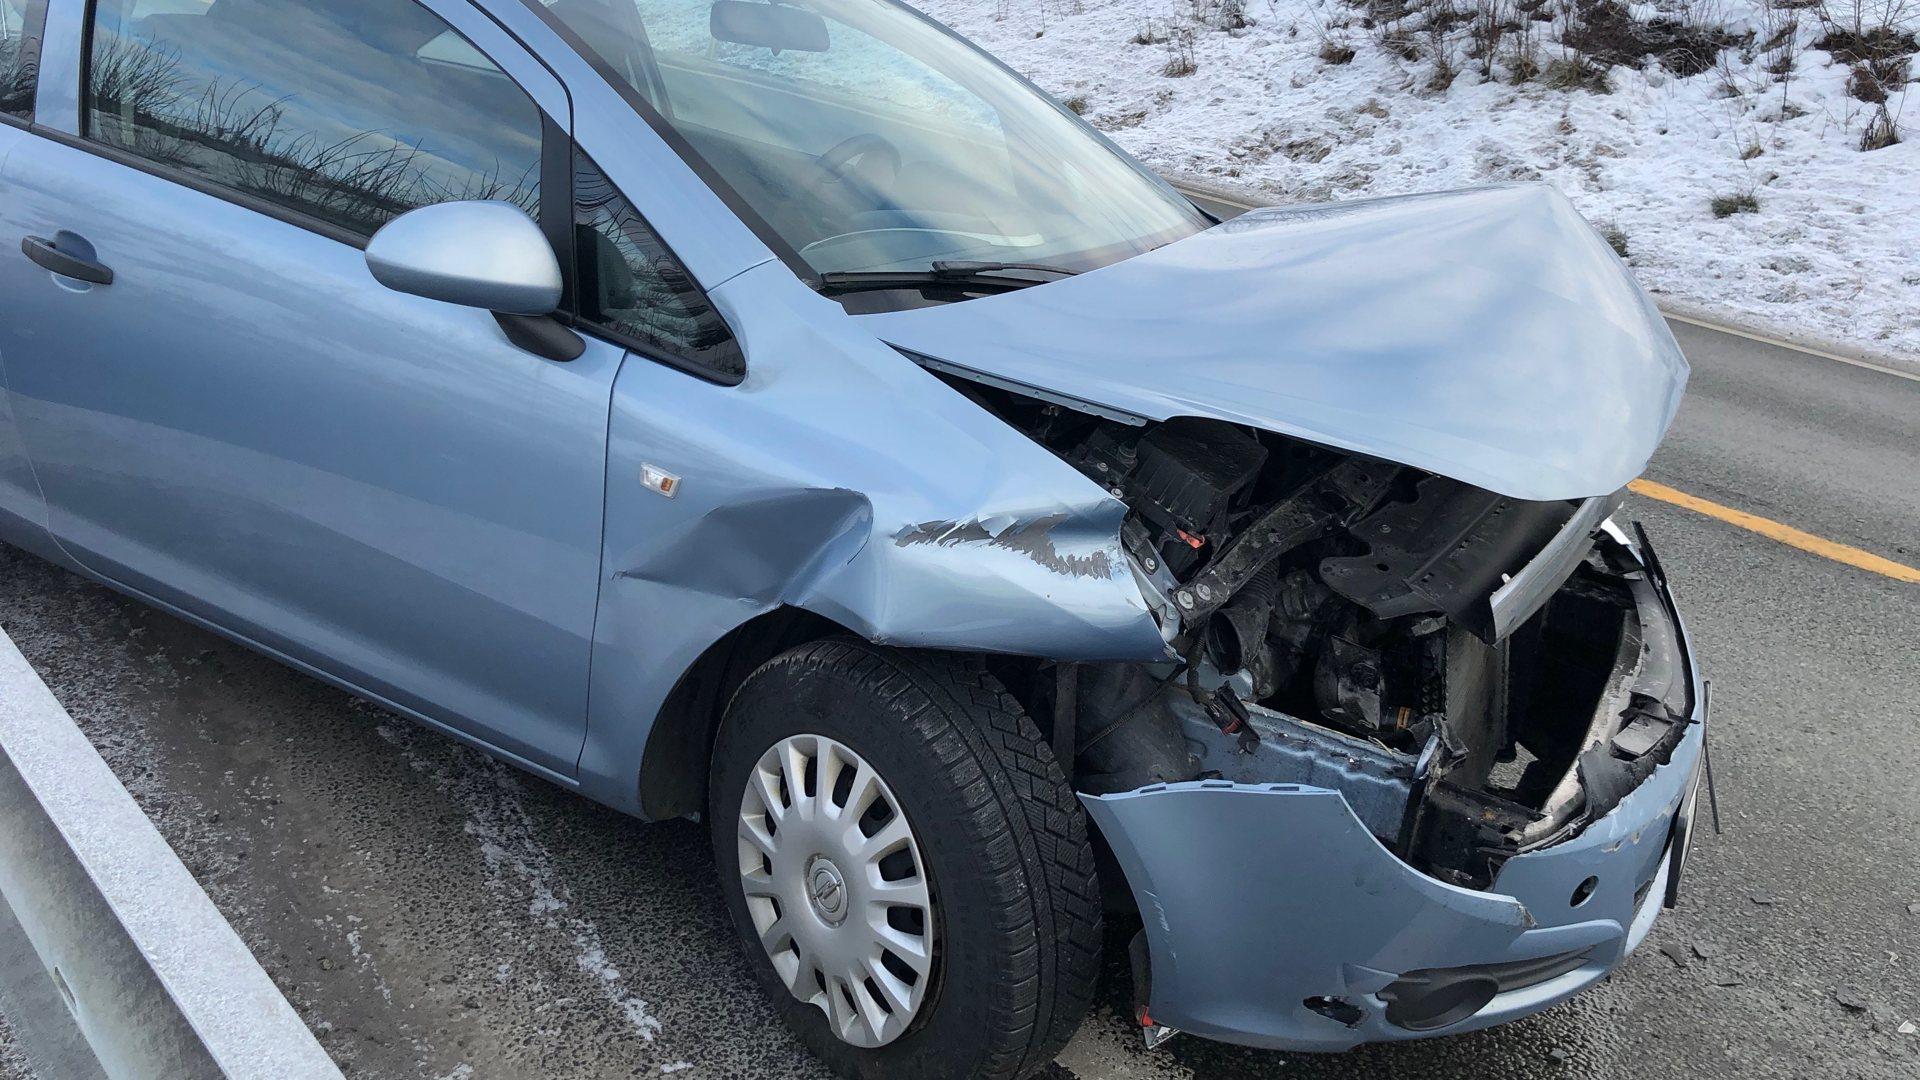 Krasjet i autovernet på riksvei 350 i Åmot